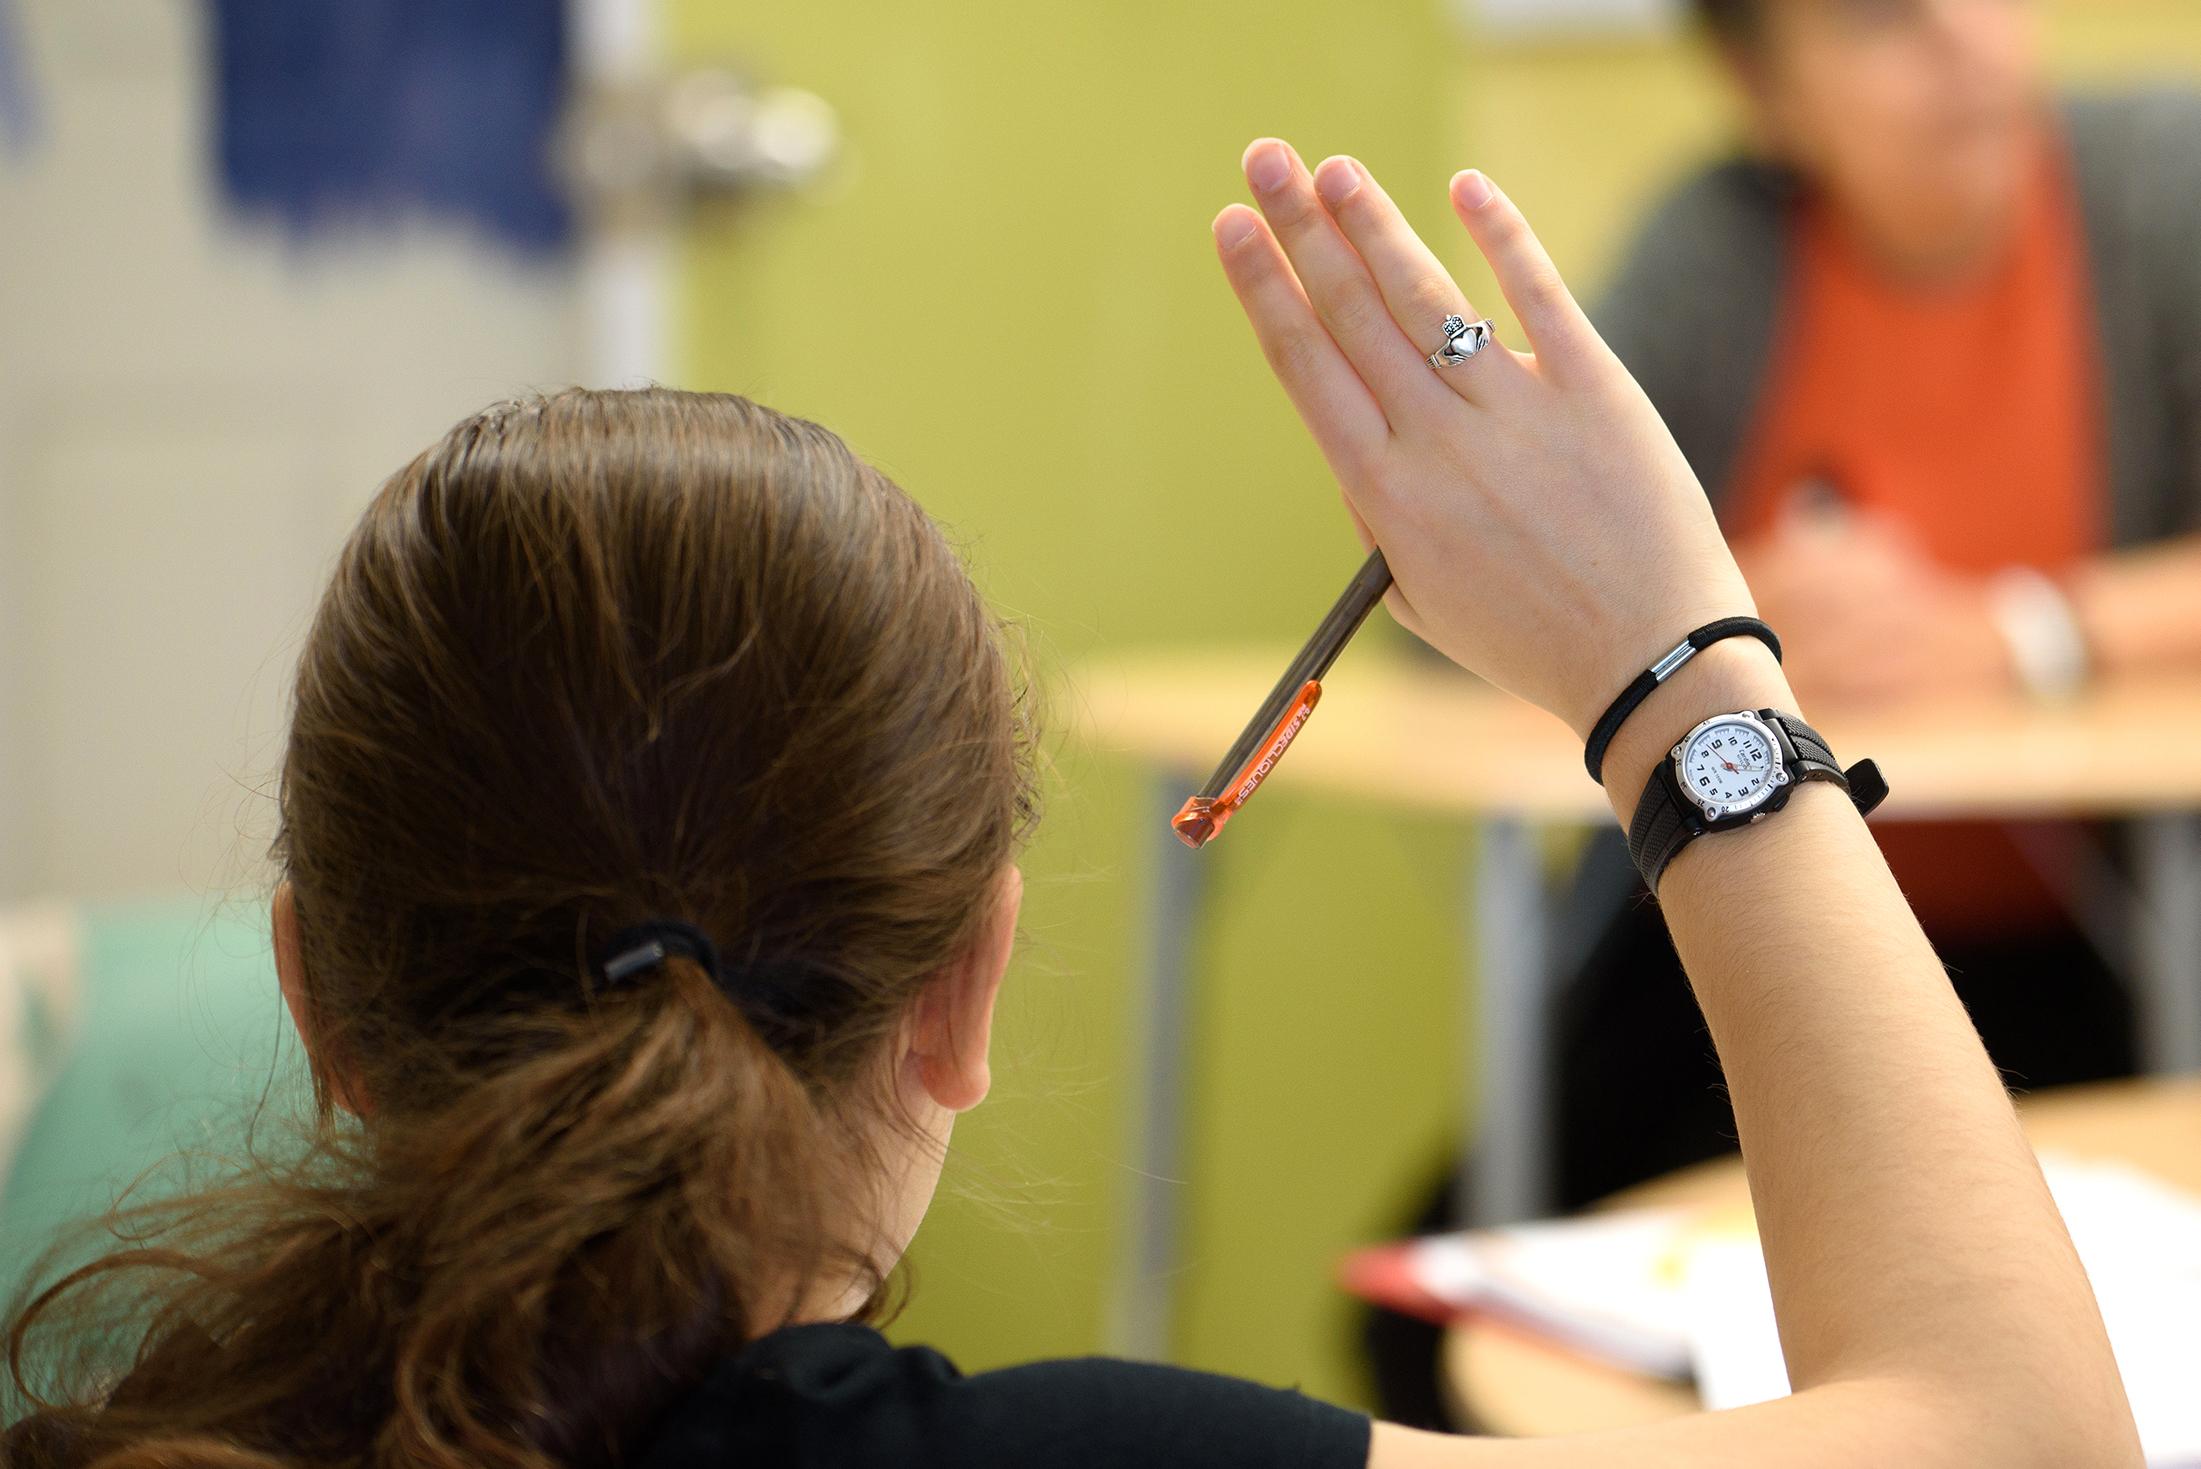 Classroom_hands2.jpg